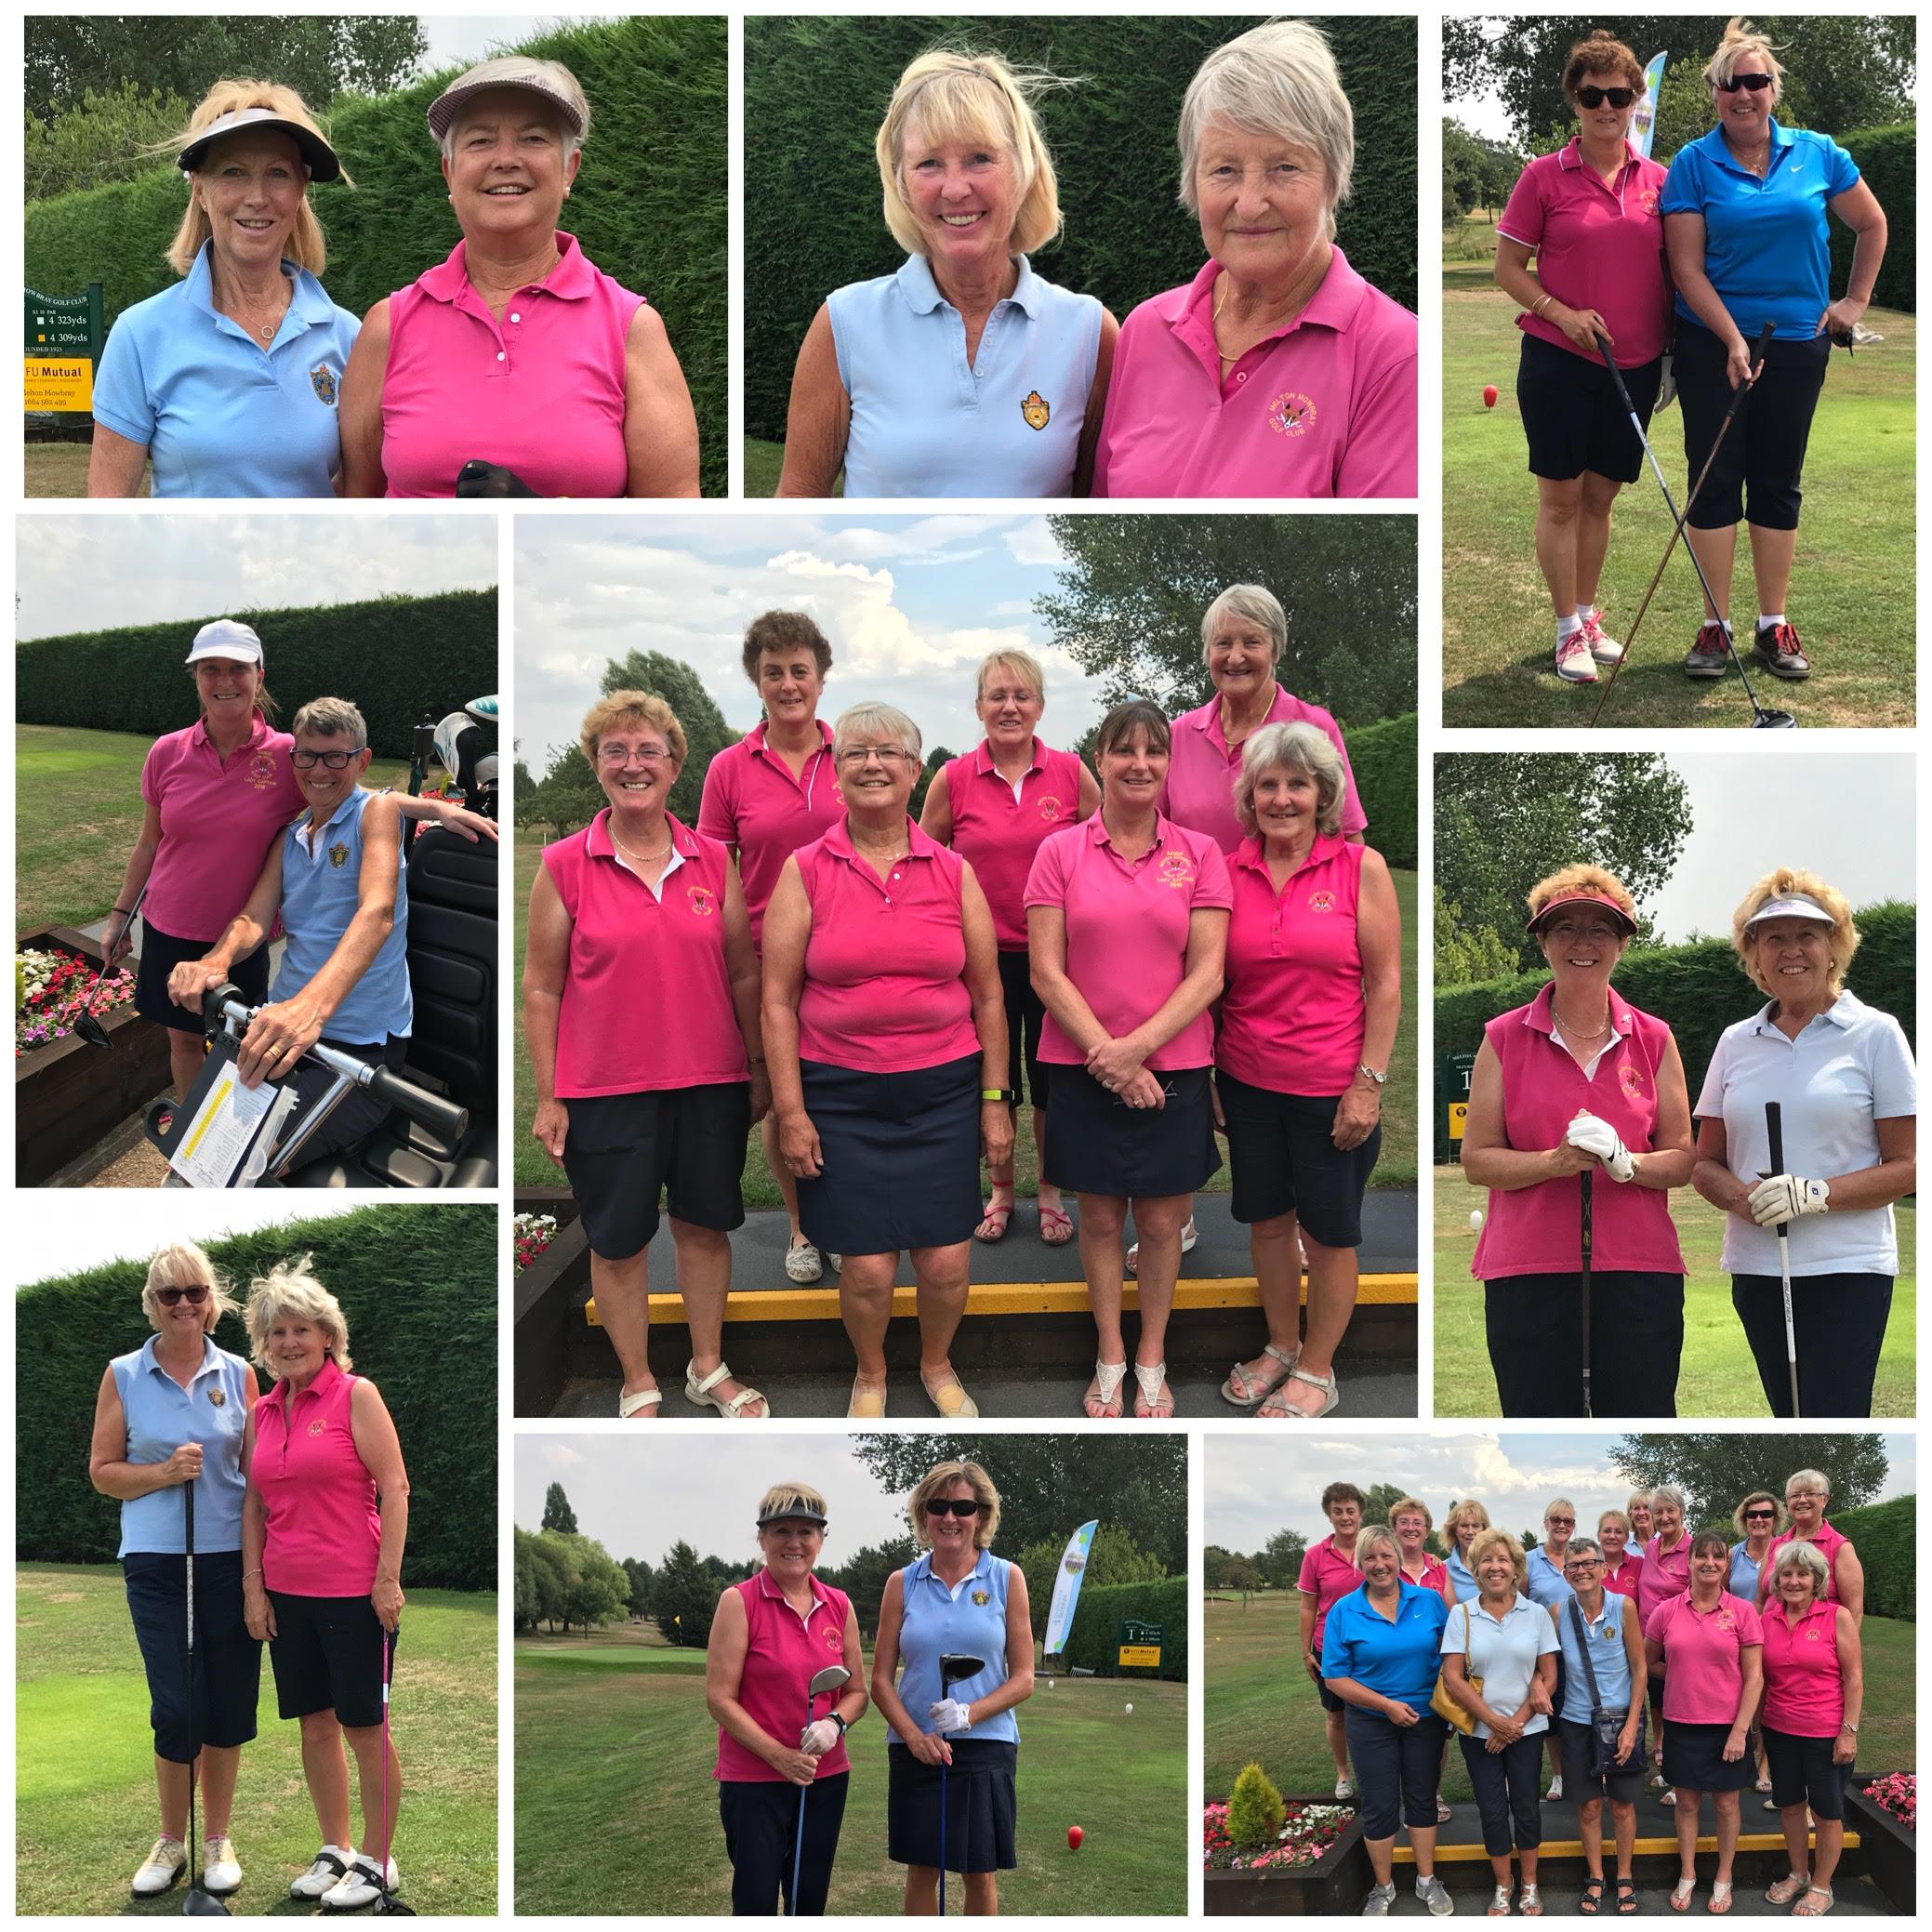 MMGC Ladies in another Tasker Triumph